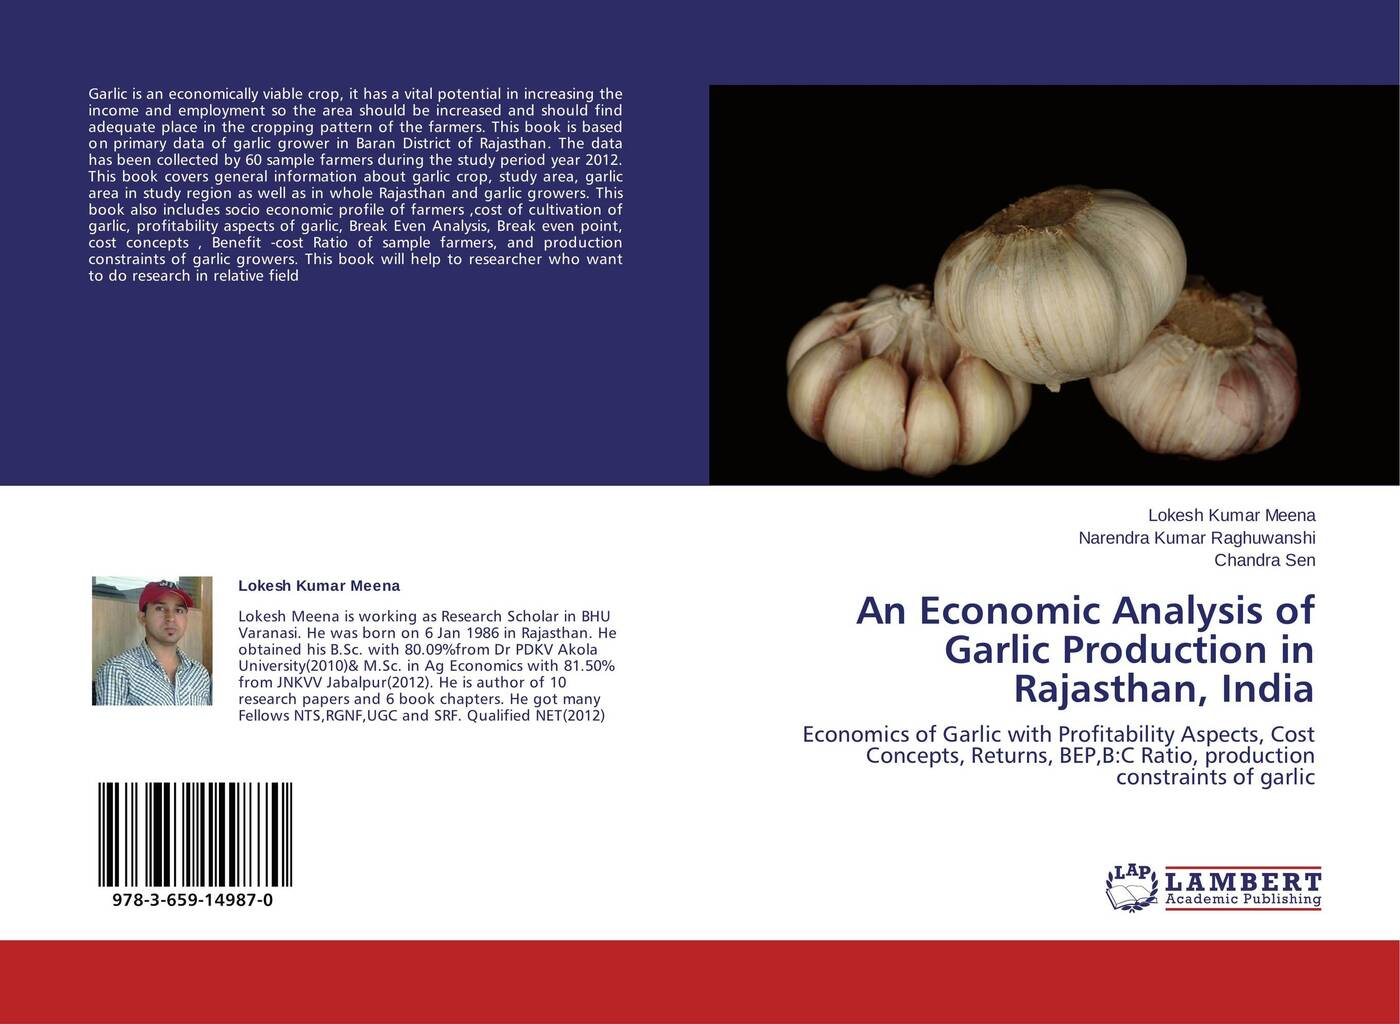 Lokesh Kumar Meena,Narendra Kumar Raghuwanshi and Chandra Sen An Economic Analysis of Garlic Production in Rajasthan, India цена в Москве и Питере